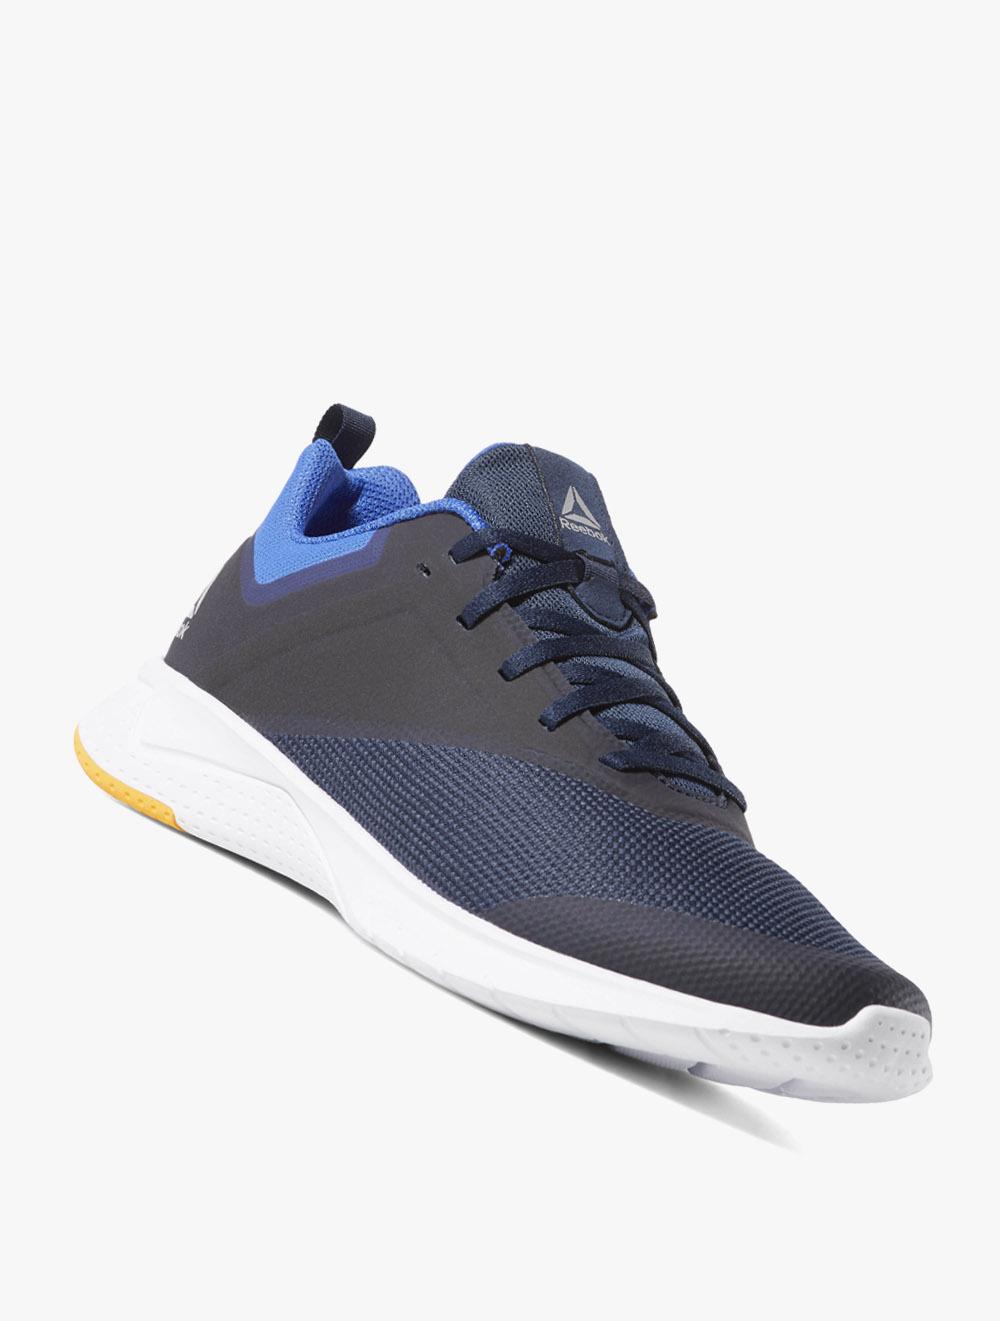 Reebok Print Lite Rush 2.0 Men's Running Shoes